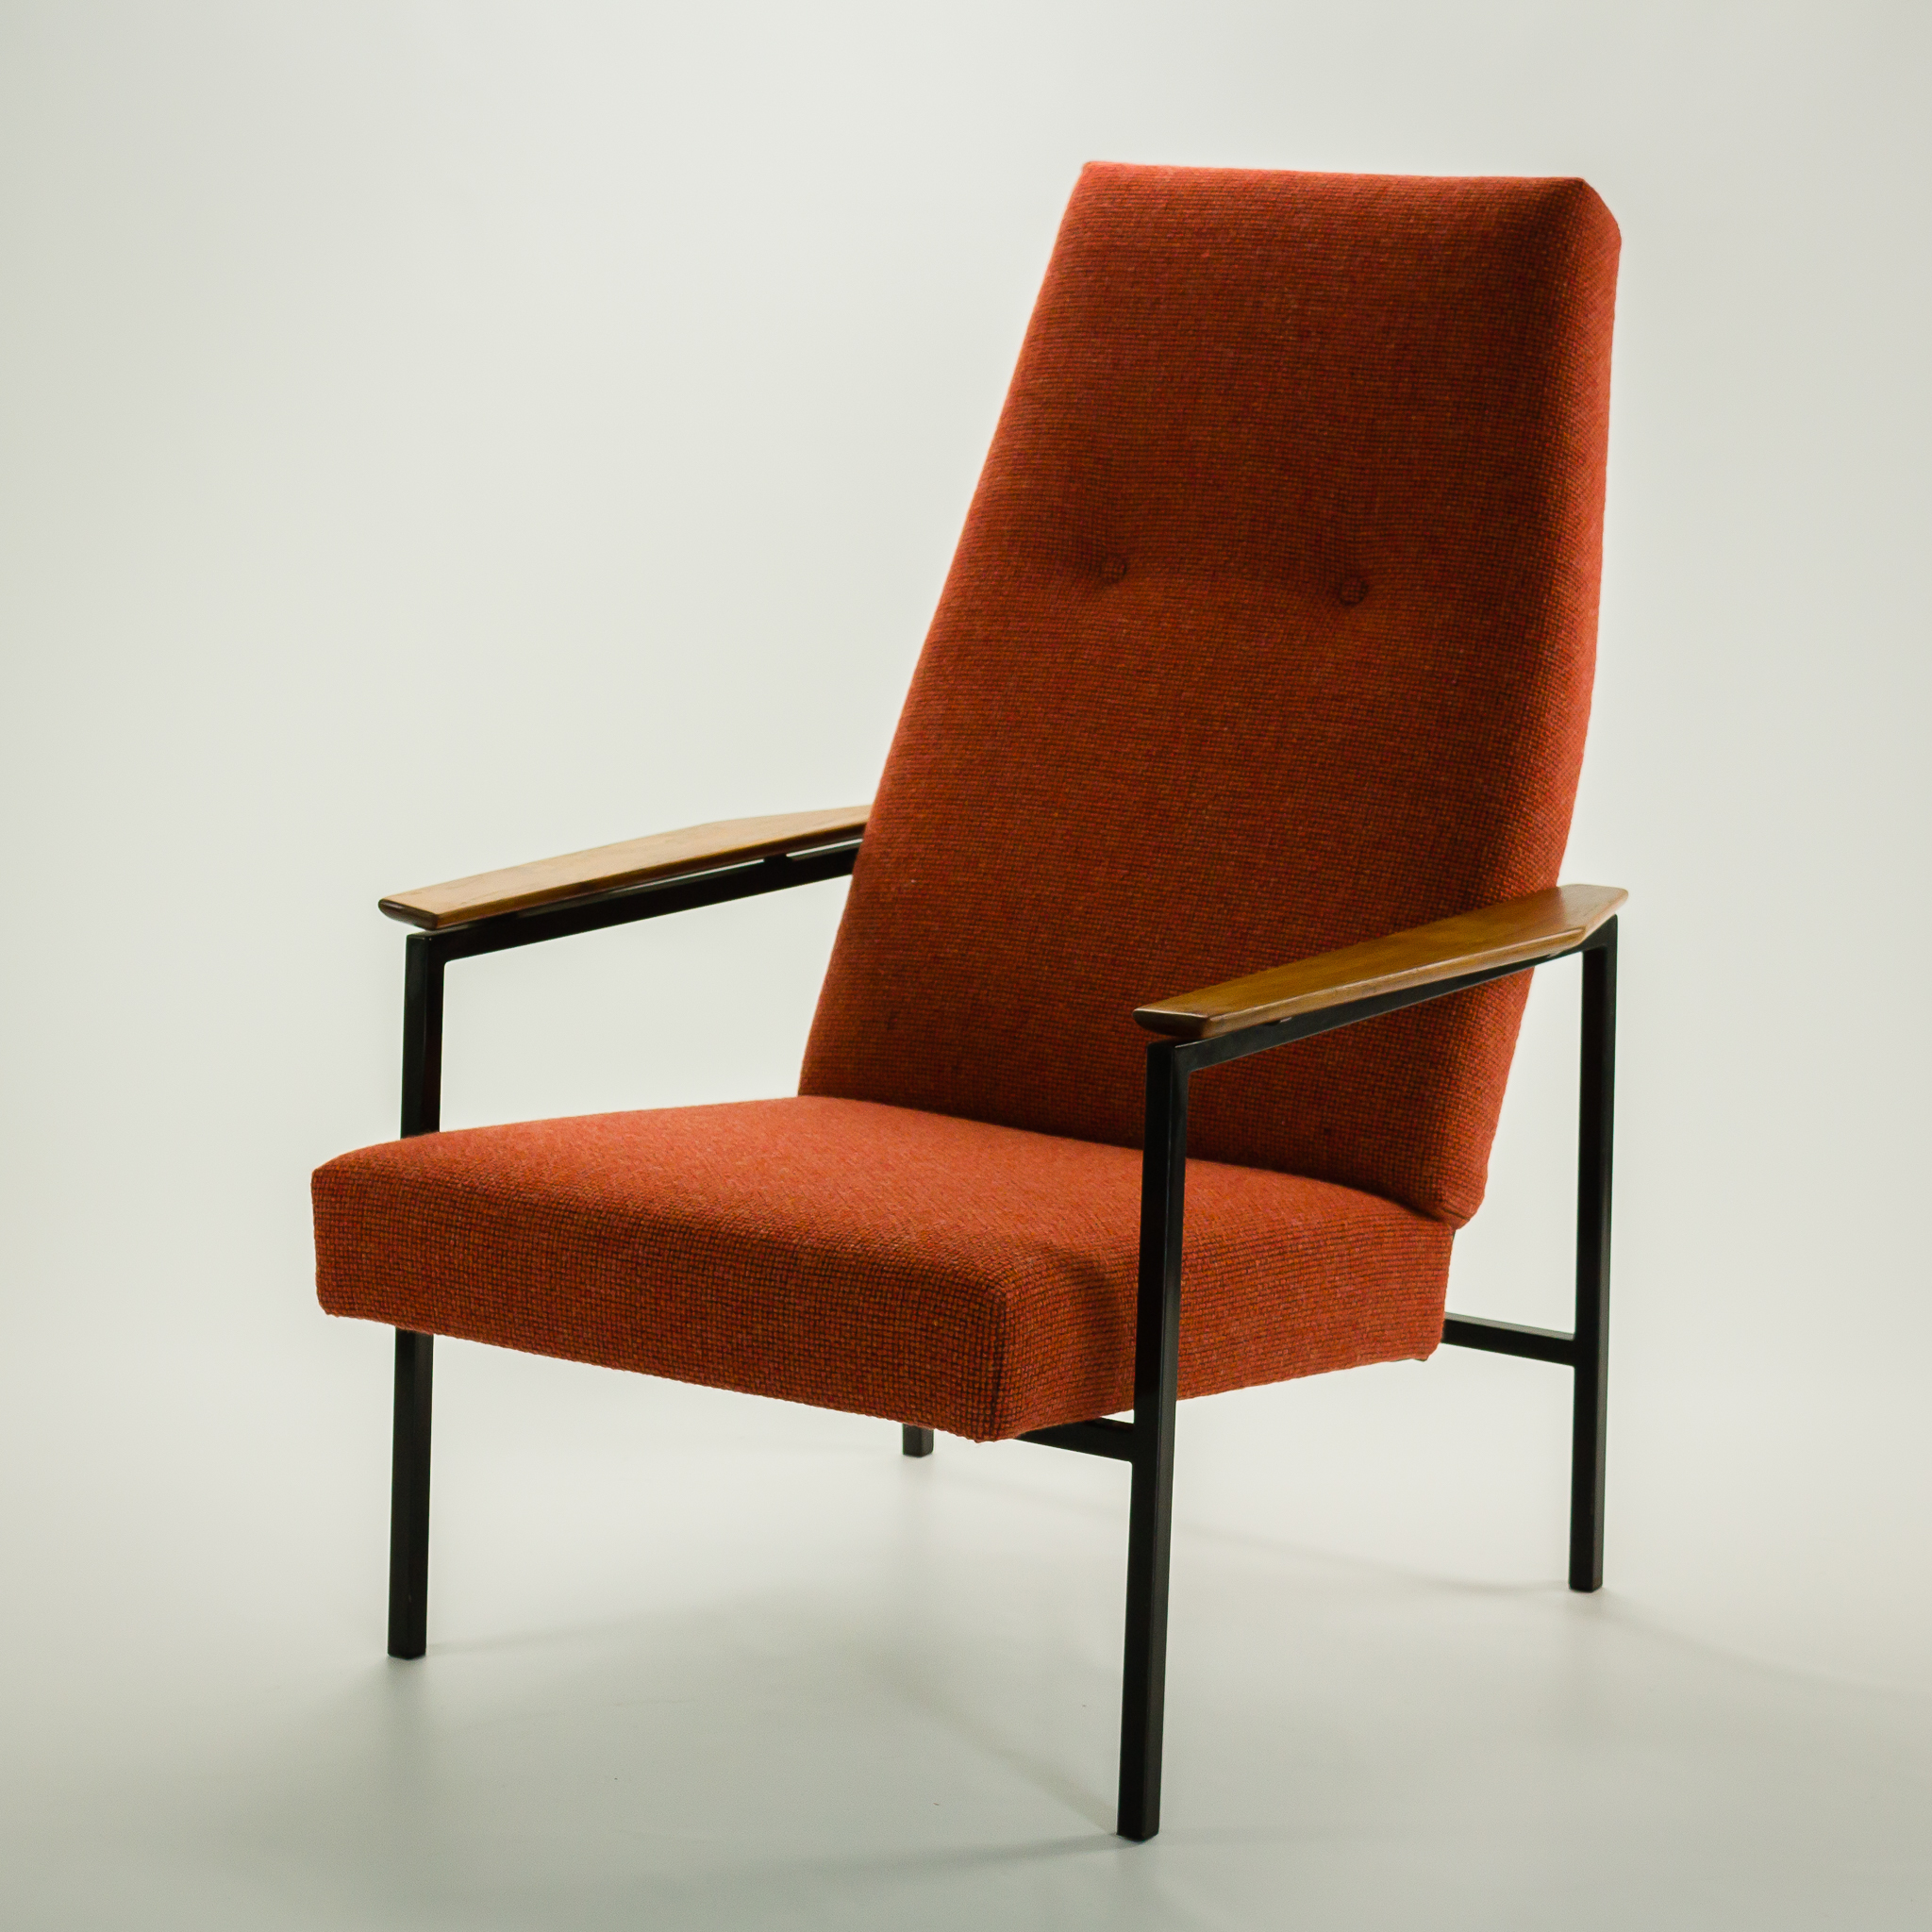 60 s martin visser fauteuil voor t spectrum barbmama. Black Bedroom Furniture Sets. Home Design Ideas